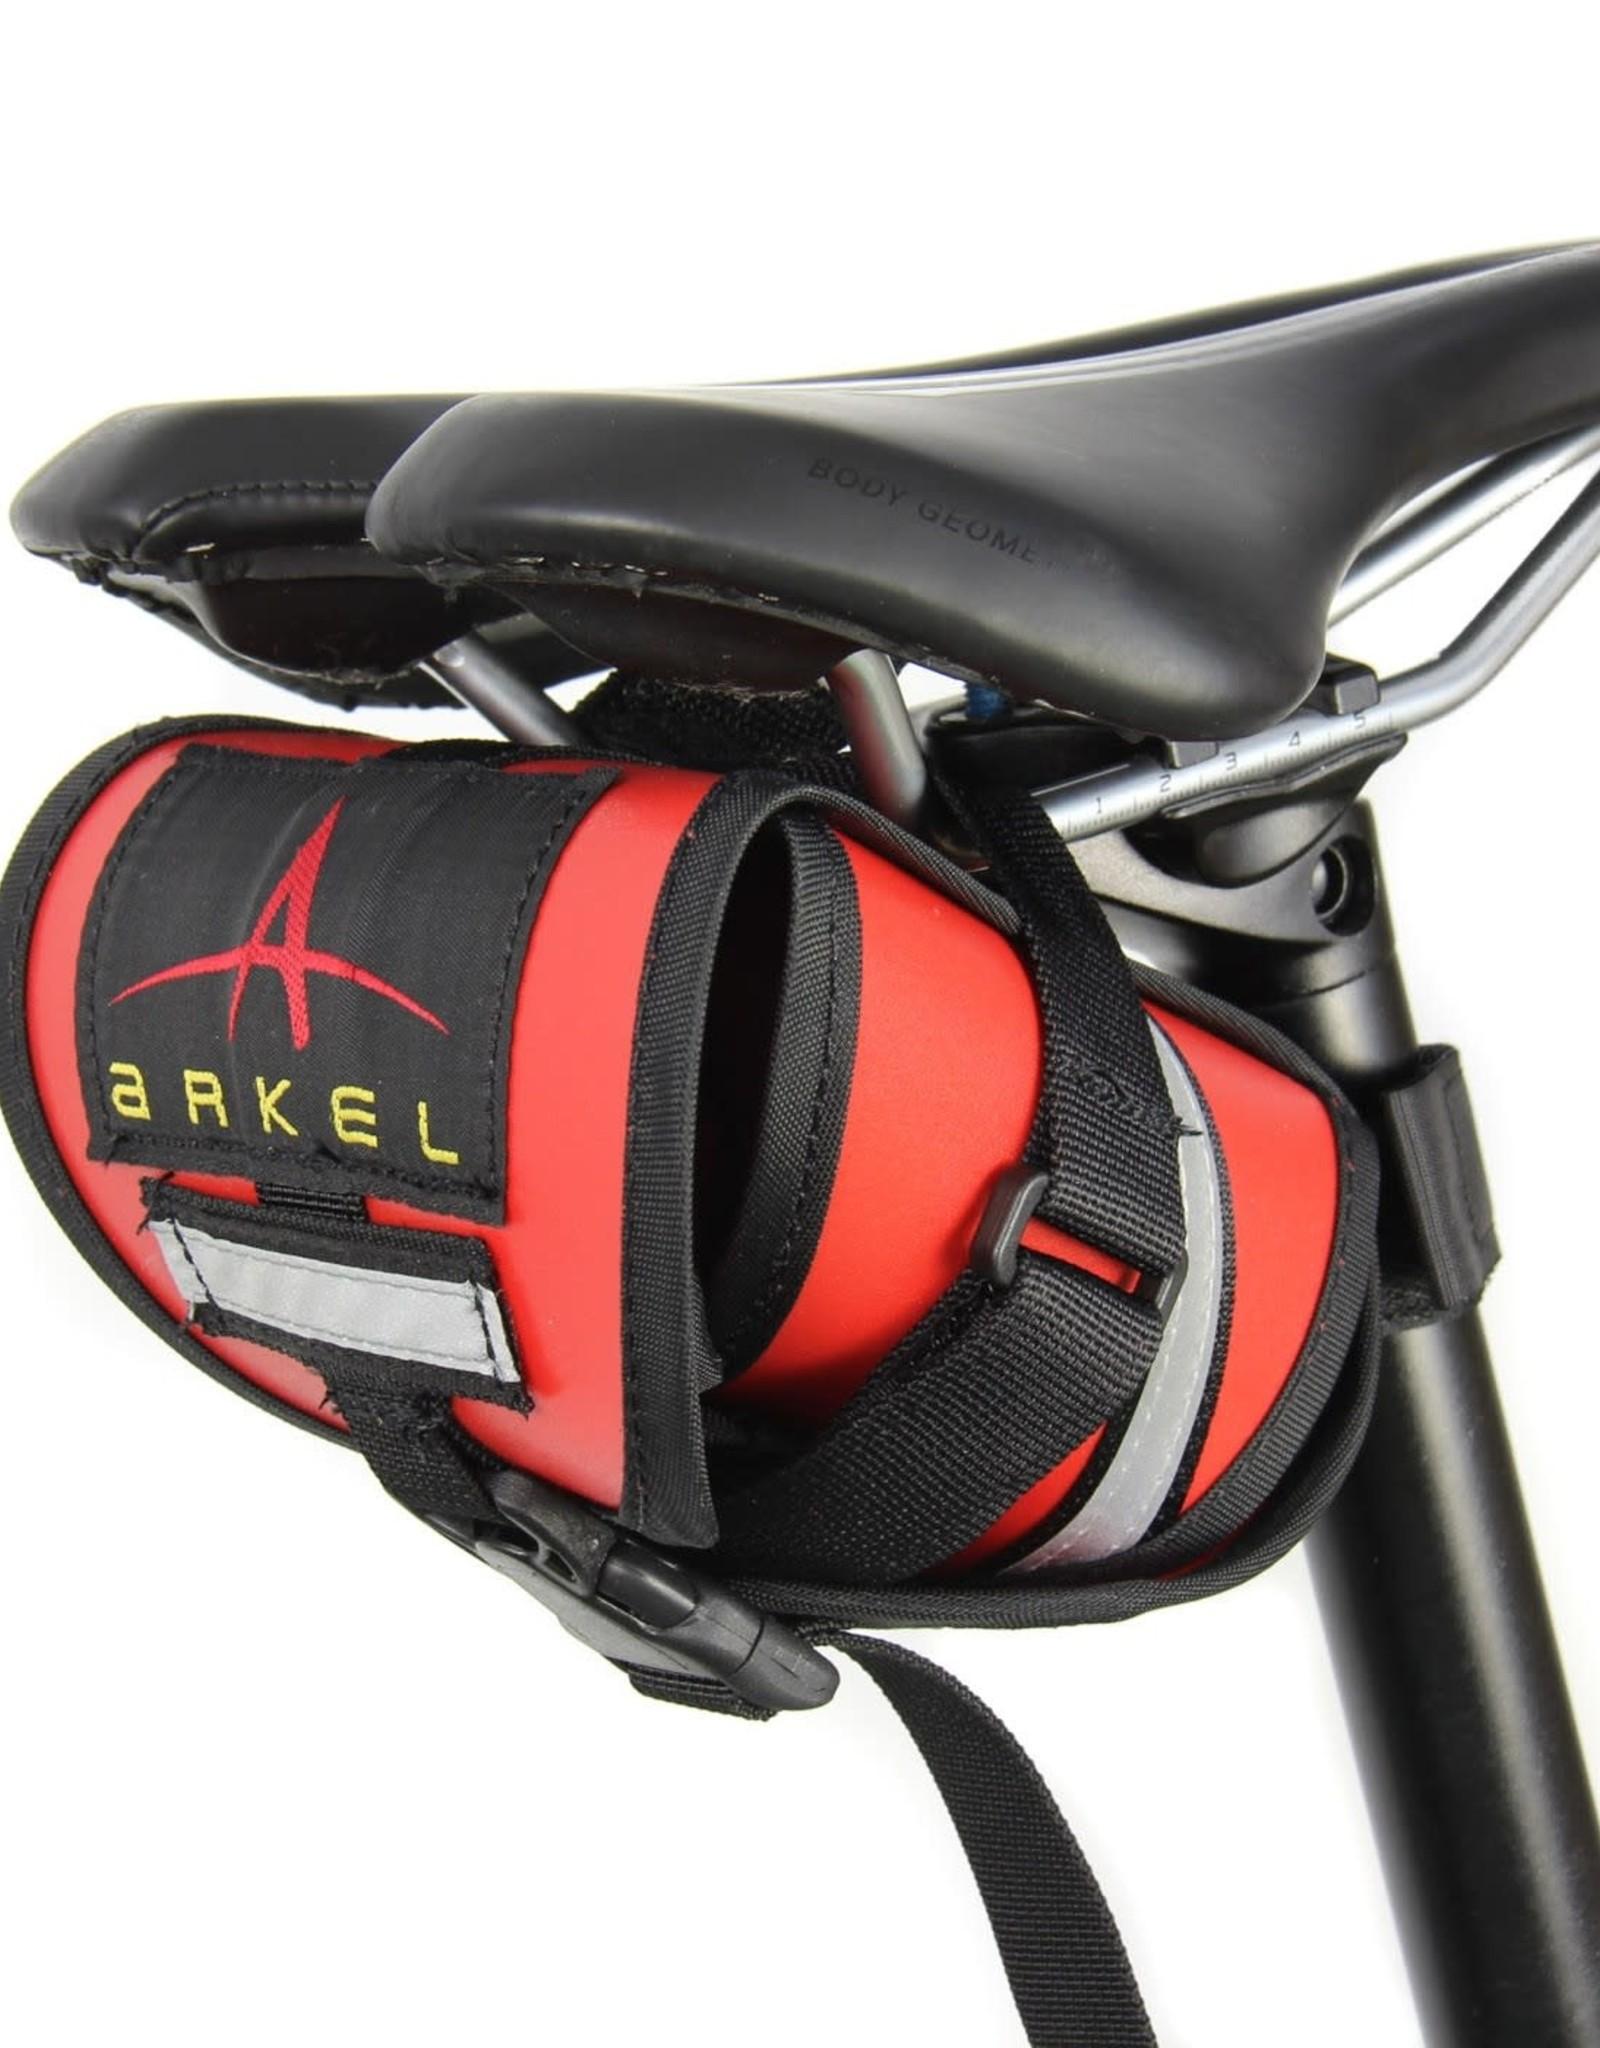 Arkel Arkel Seat Bag